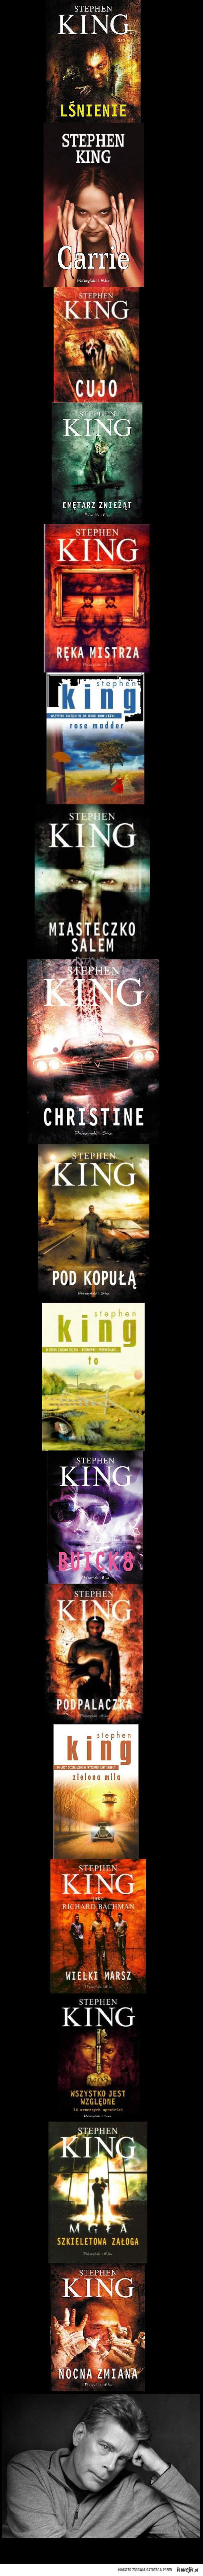 King książki